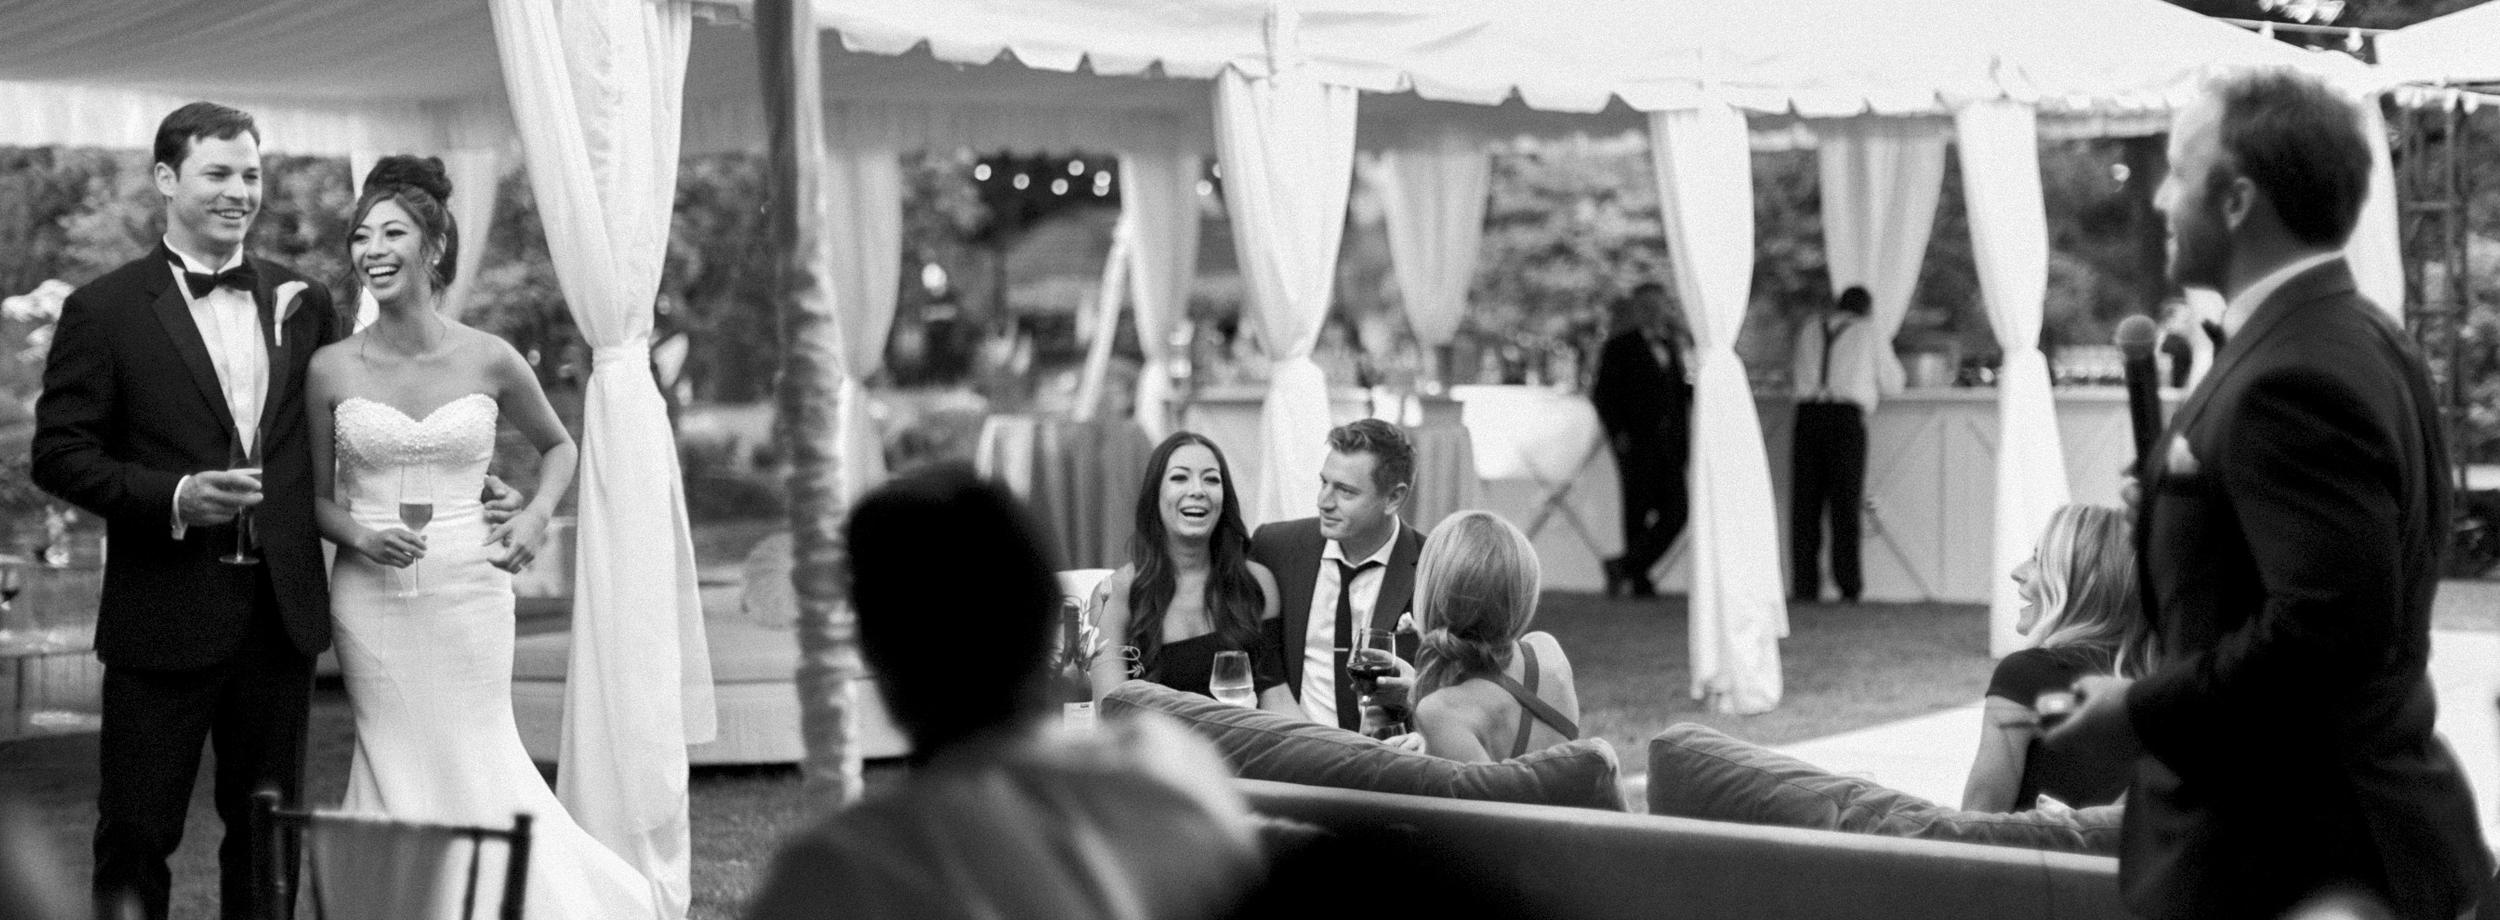 lewis&clark_wedding_videographer_banner.jpg